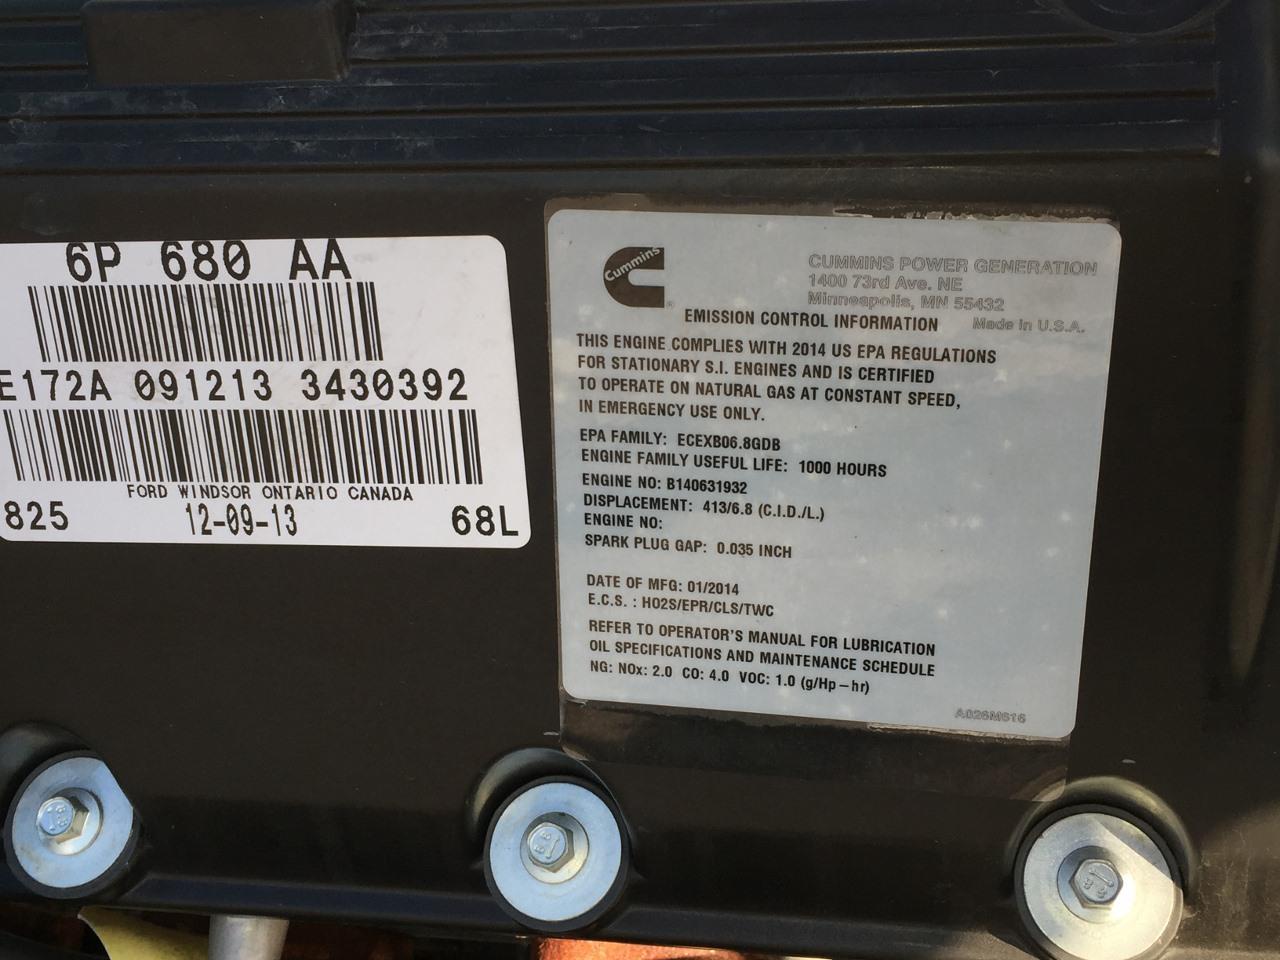 _125 kW Cummins/Onan Generator, NEW w/ Warranty from Man , 6 8L V-10 Ford  Engine